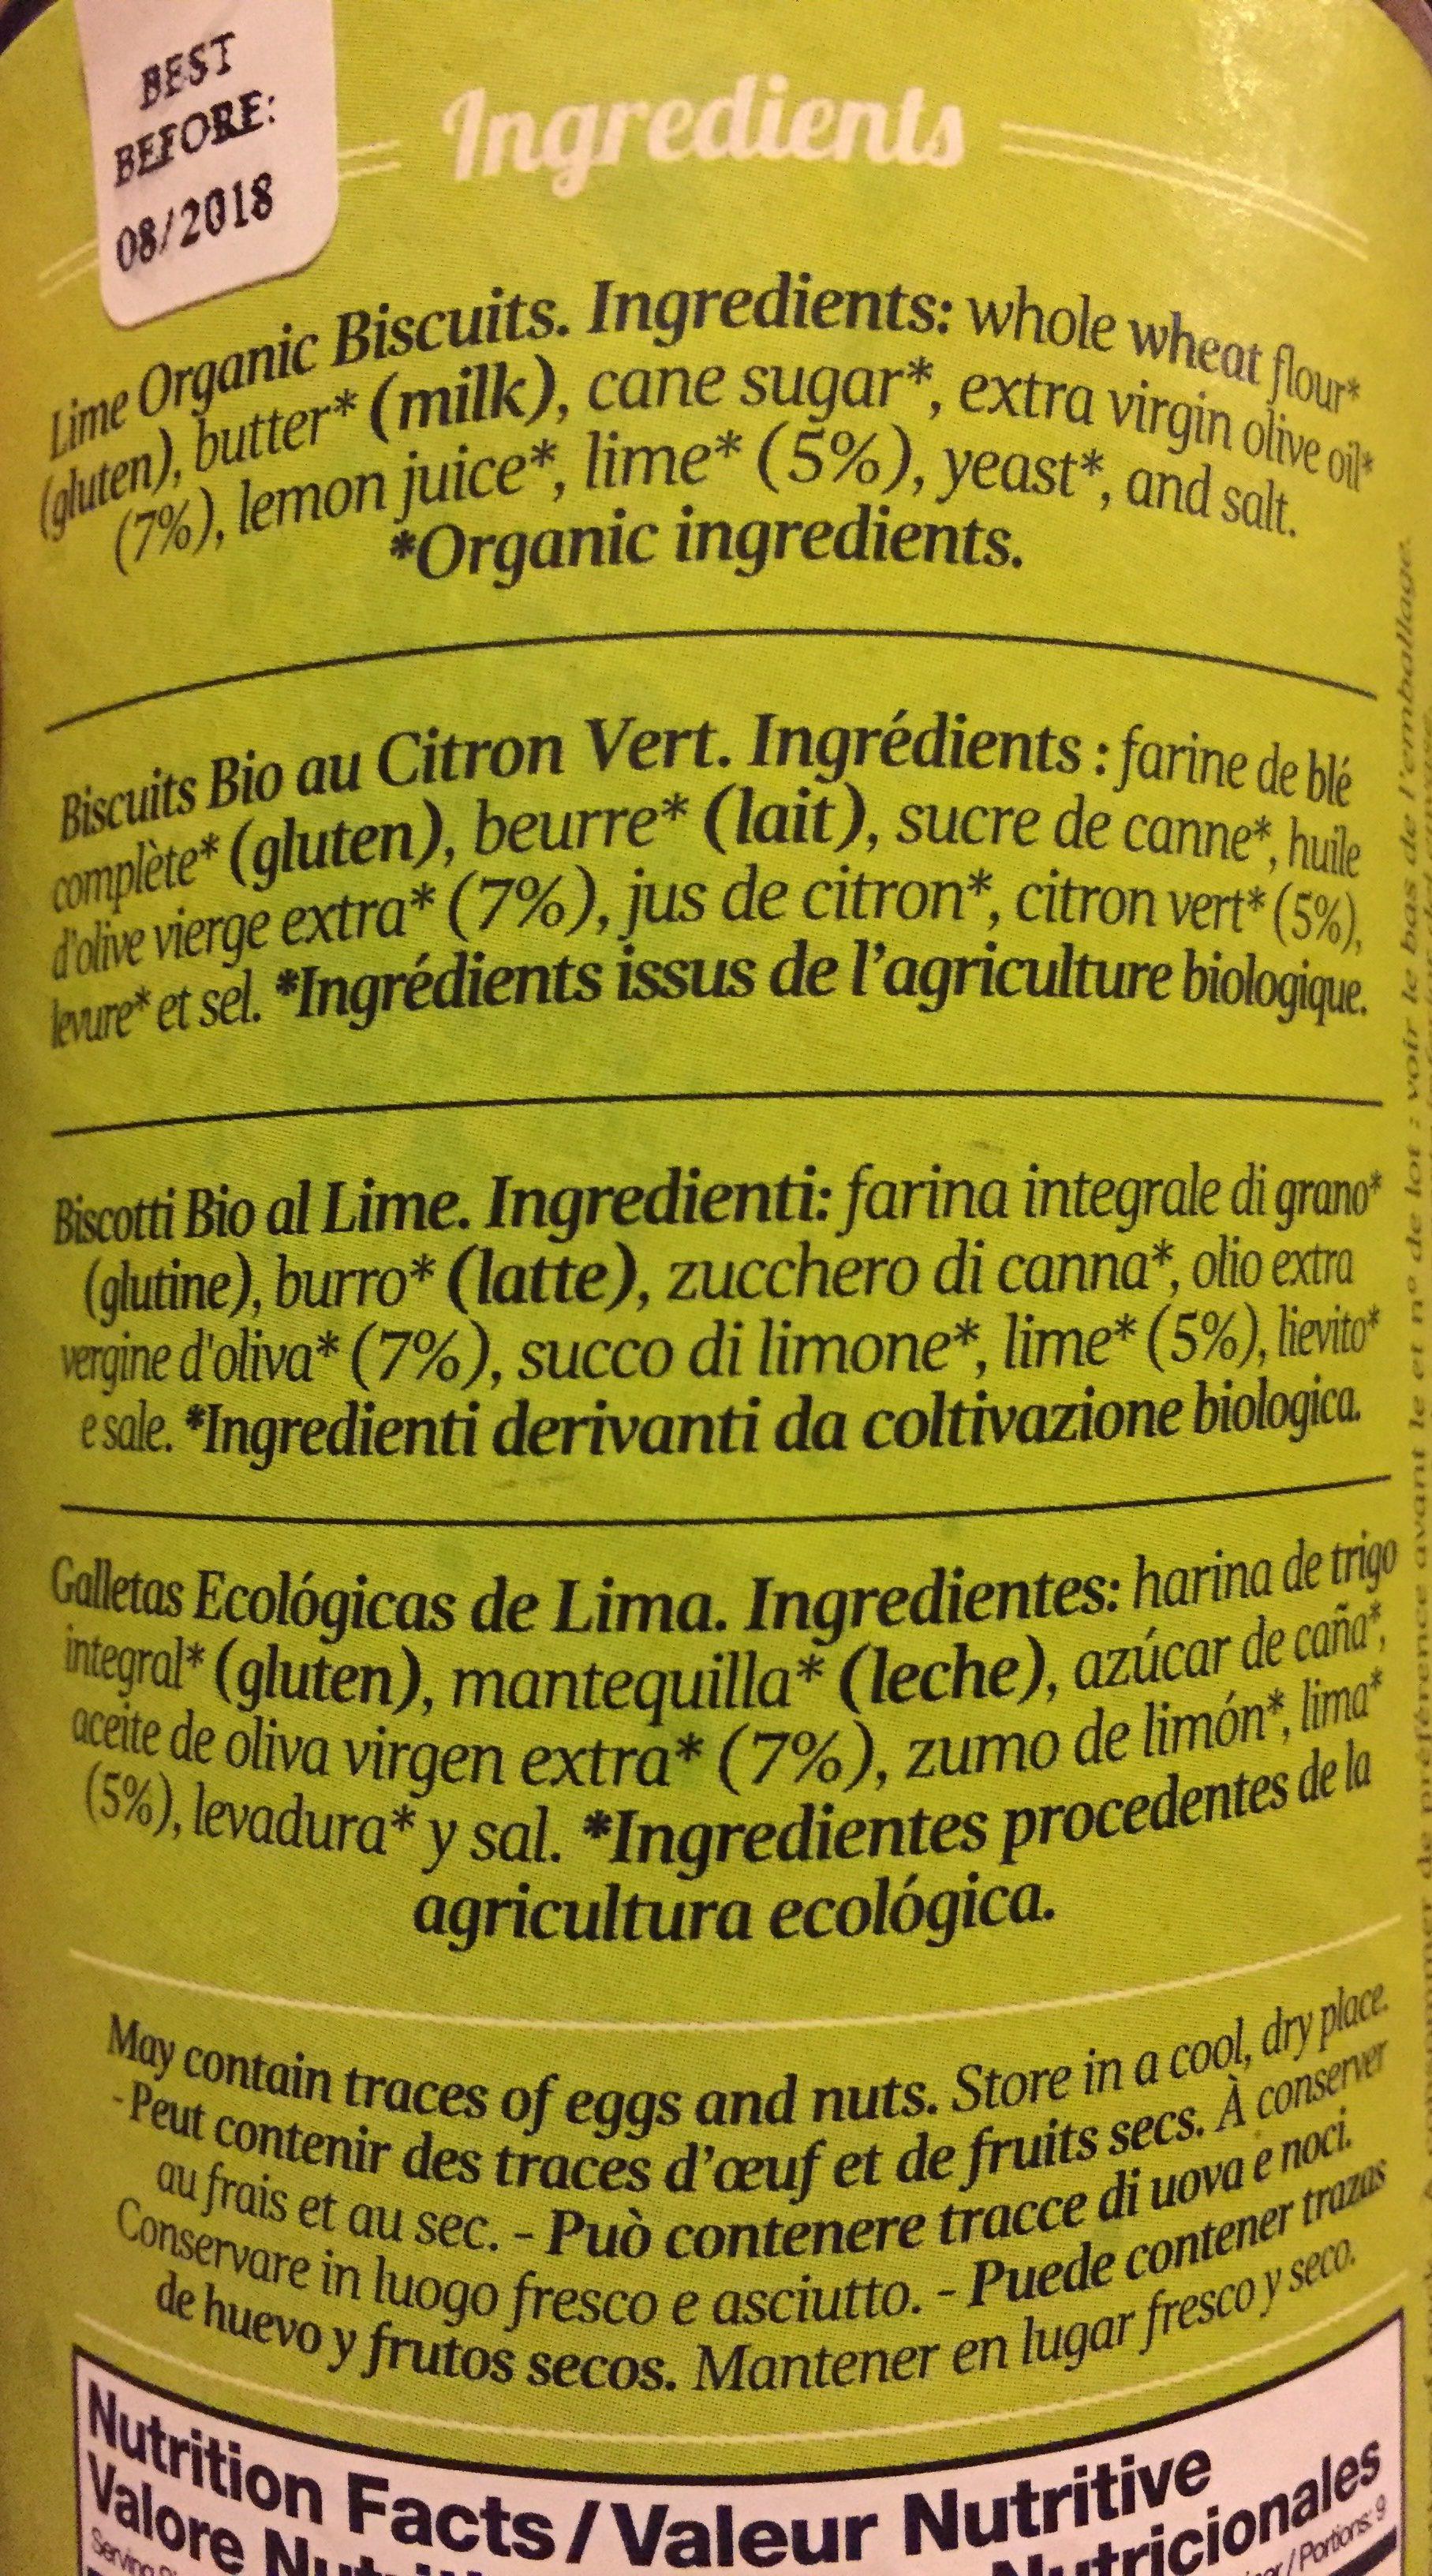 Biscuits Bio Au Citron Vert - Ingredientes